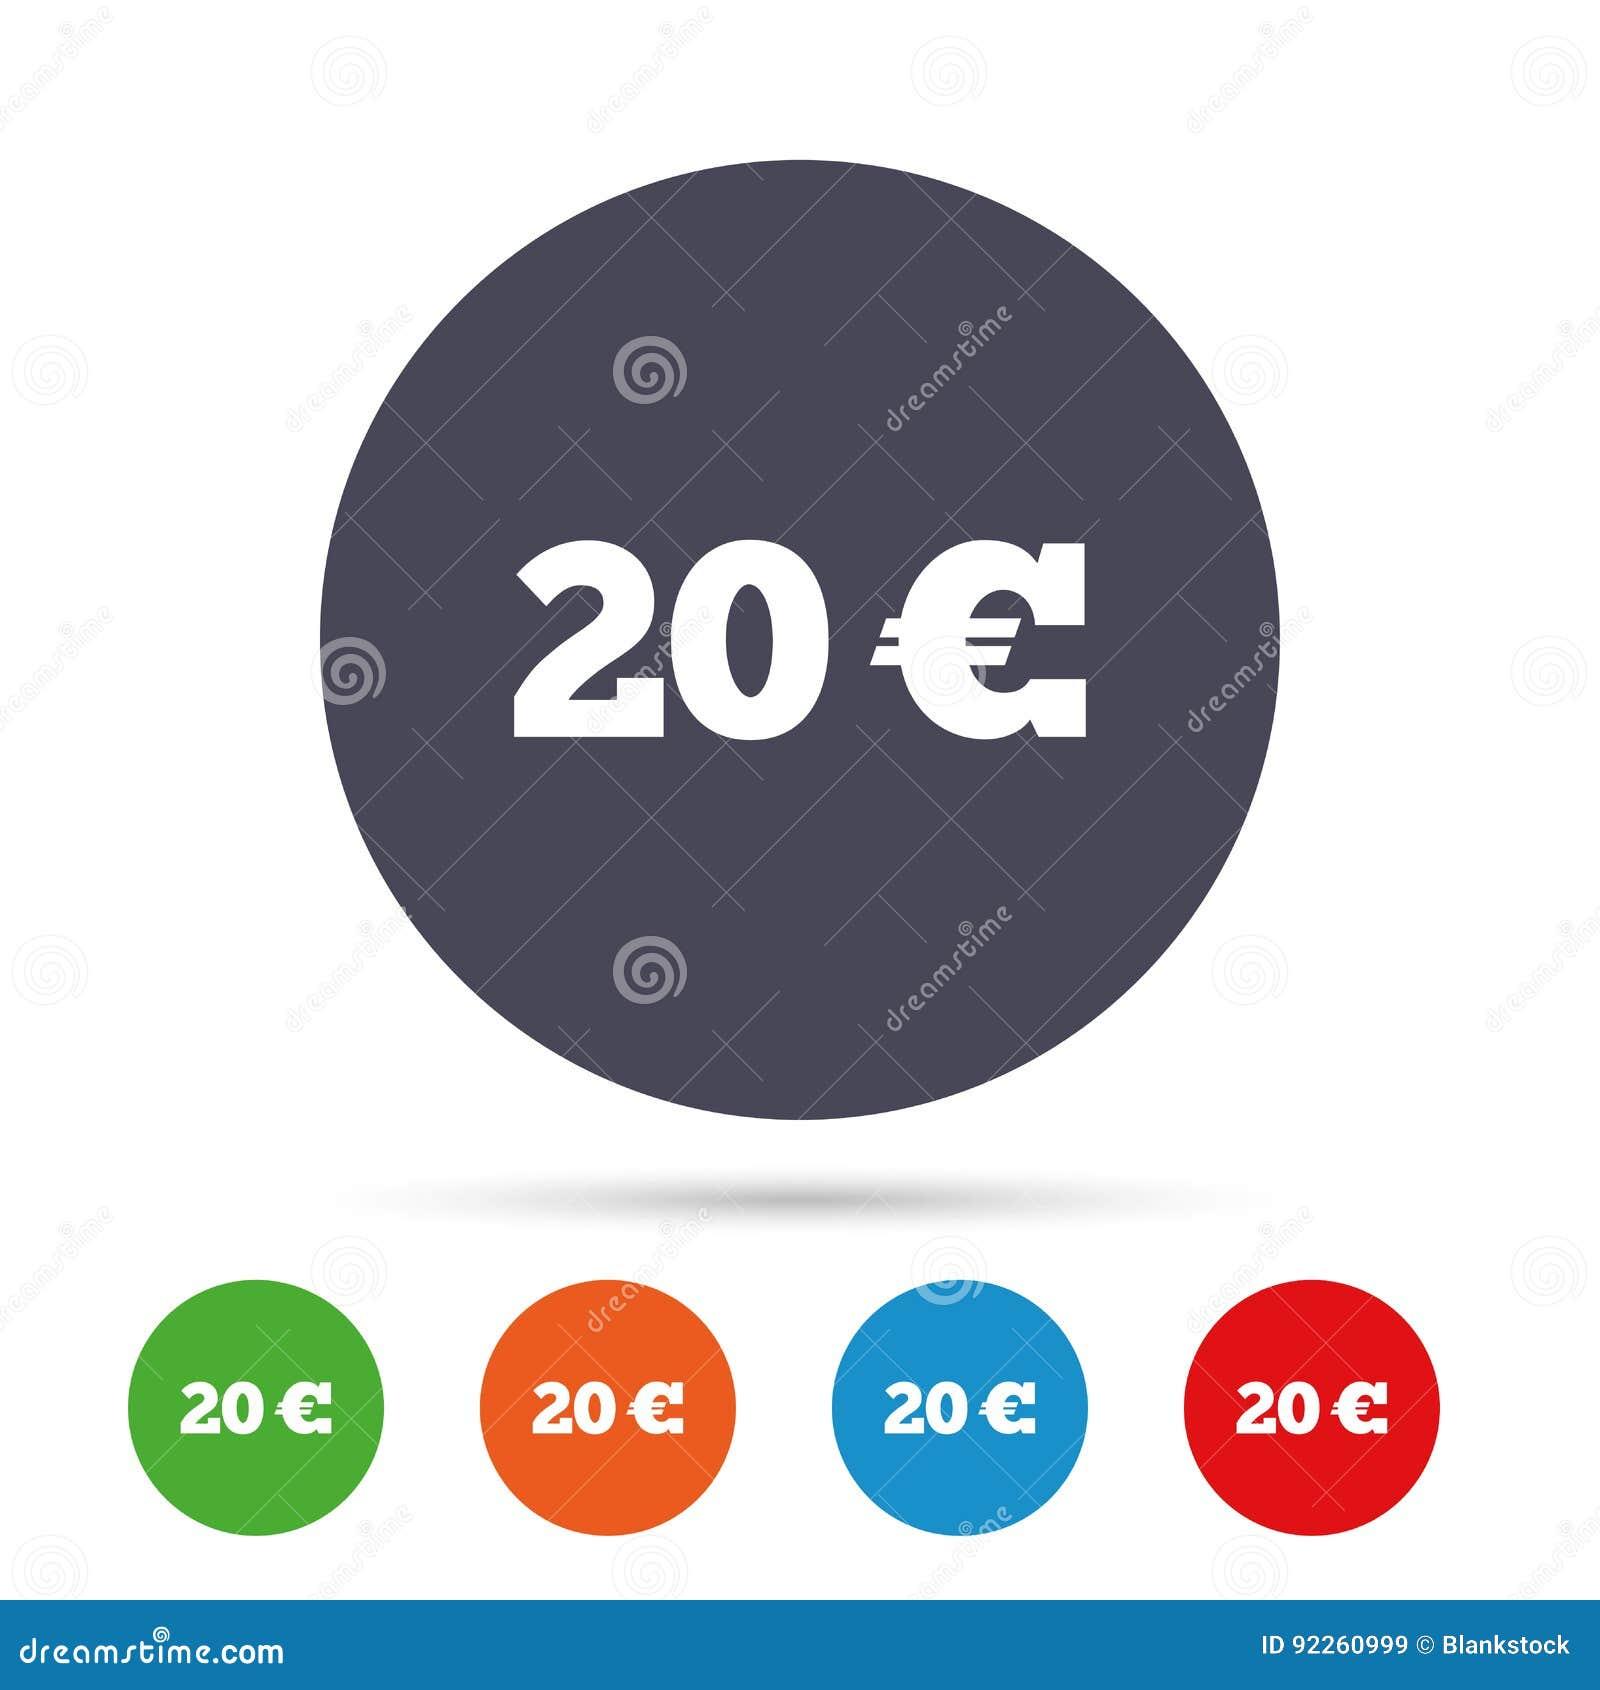 20 euro sign icon eur currency symbol stock vector illustration 20 euro sign icon eur currency symbol buycottarizona Choice Image